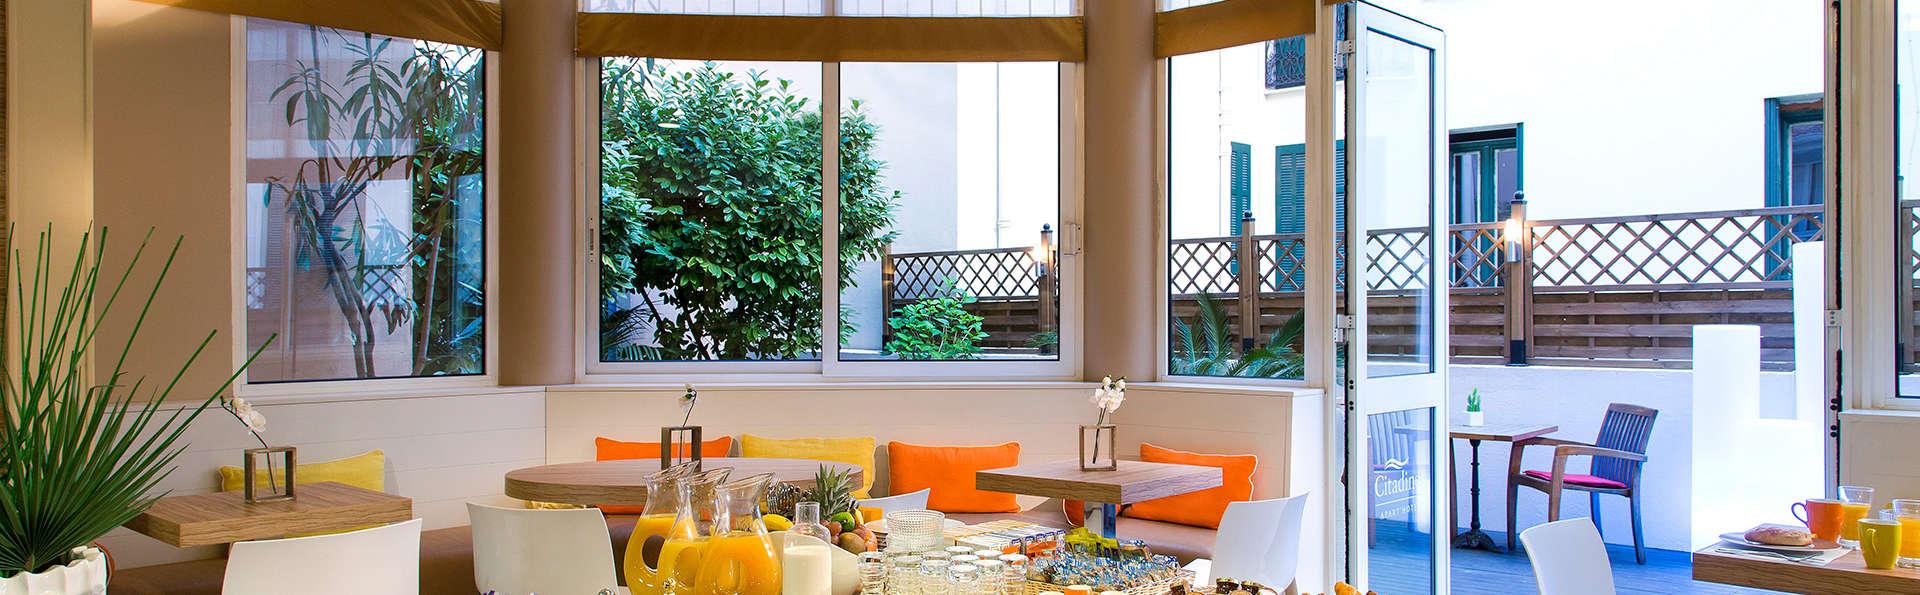 Citadines Croisette Cannes - EDIT_NEW_buffet.jpg